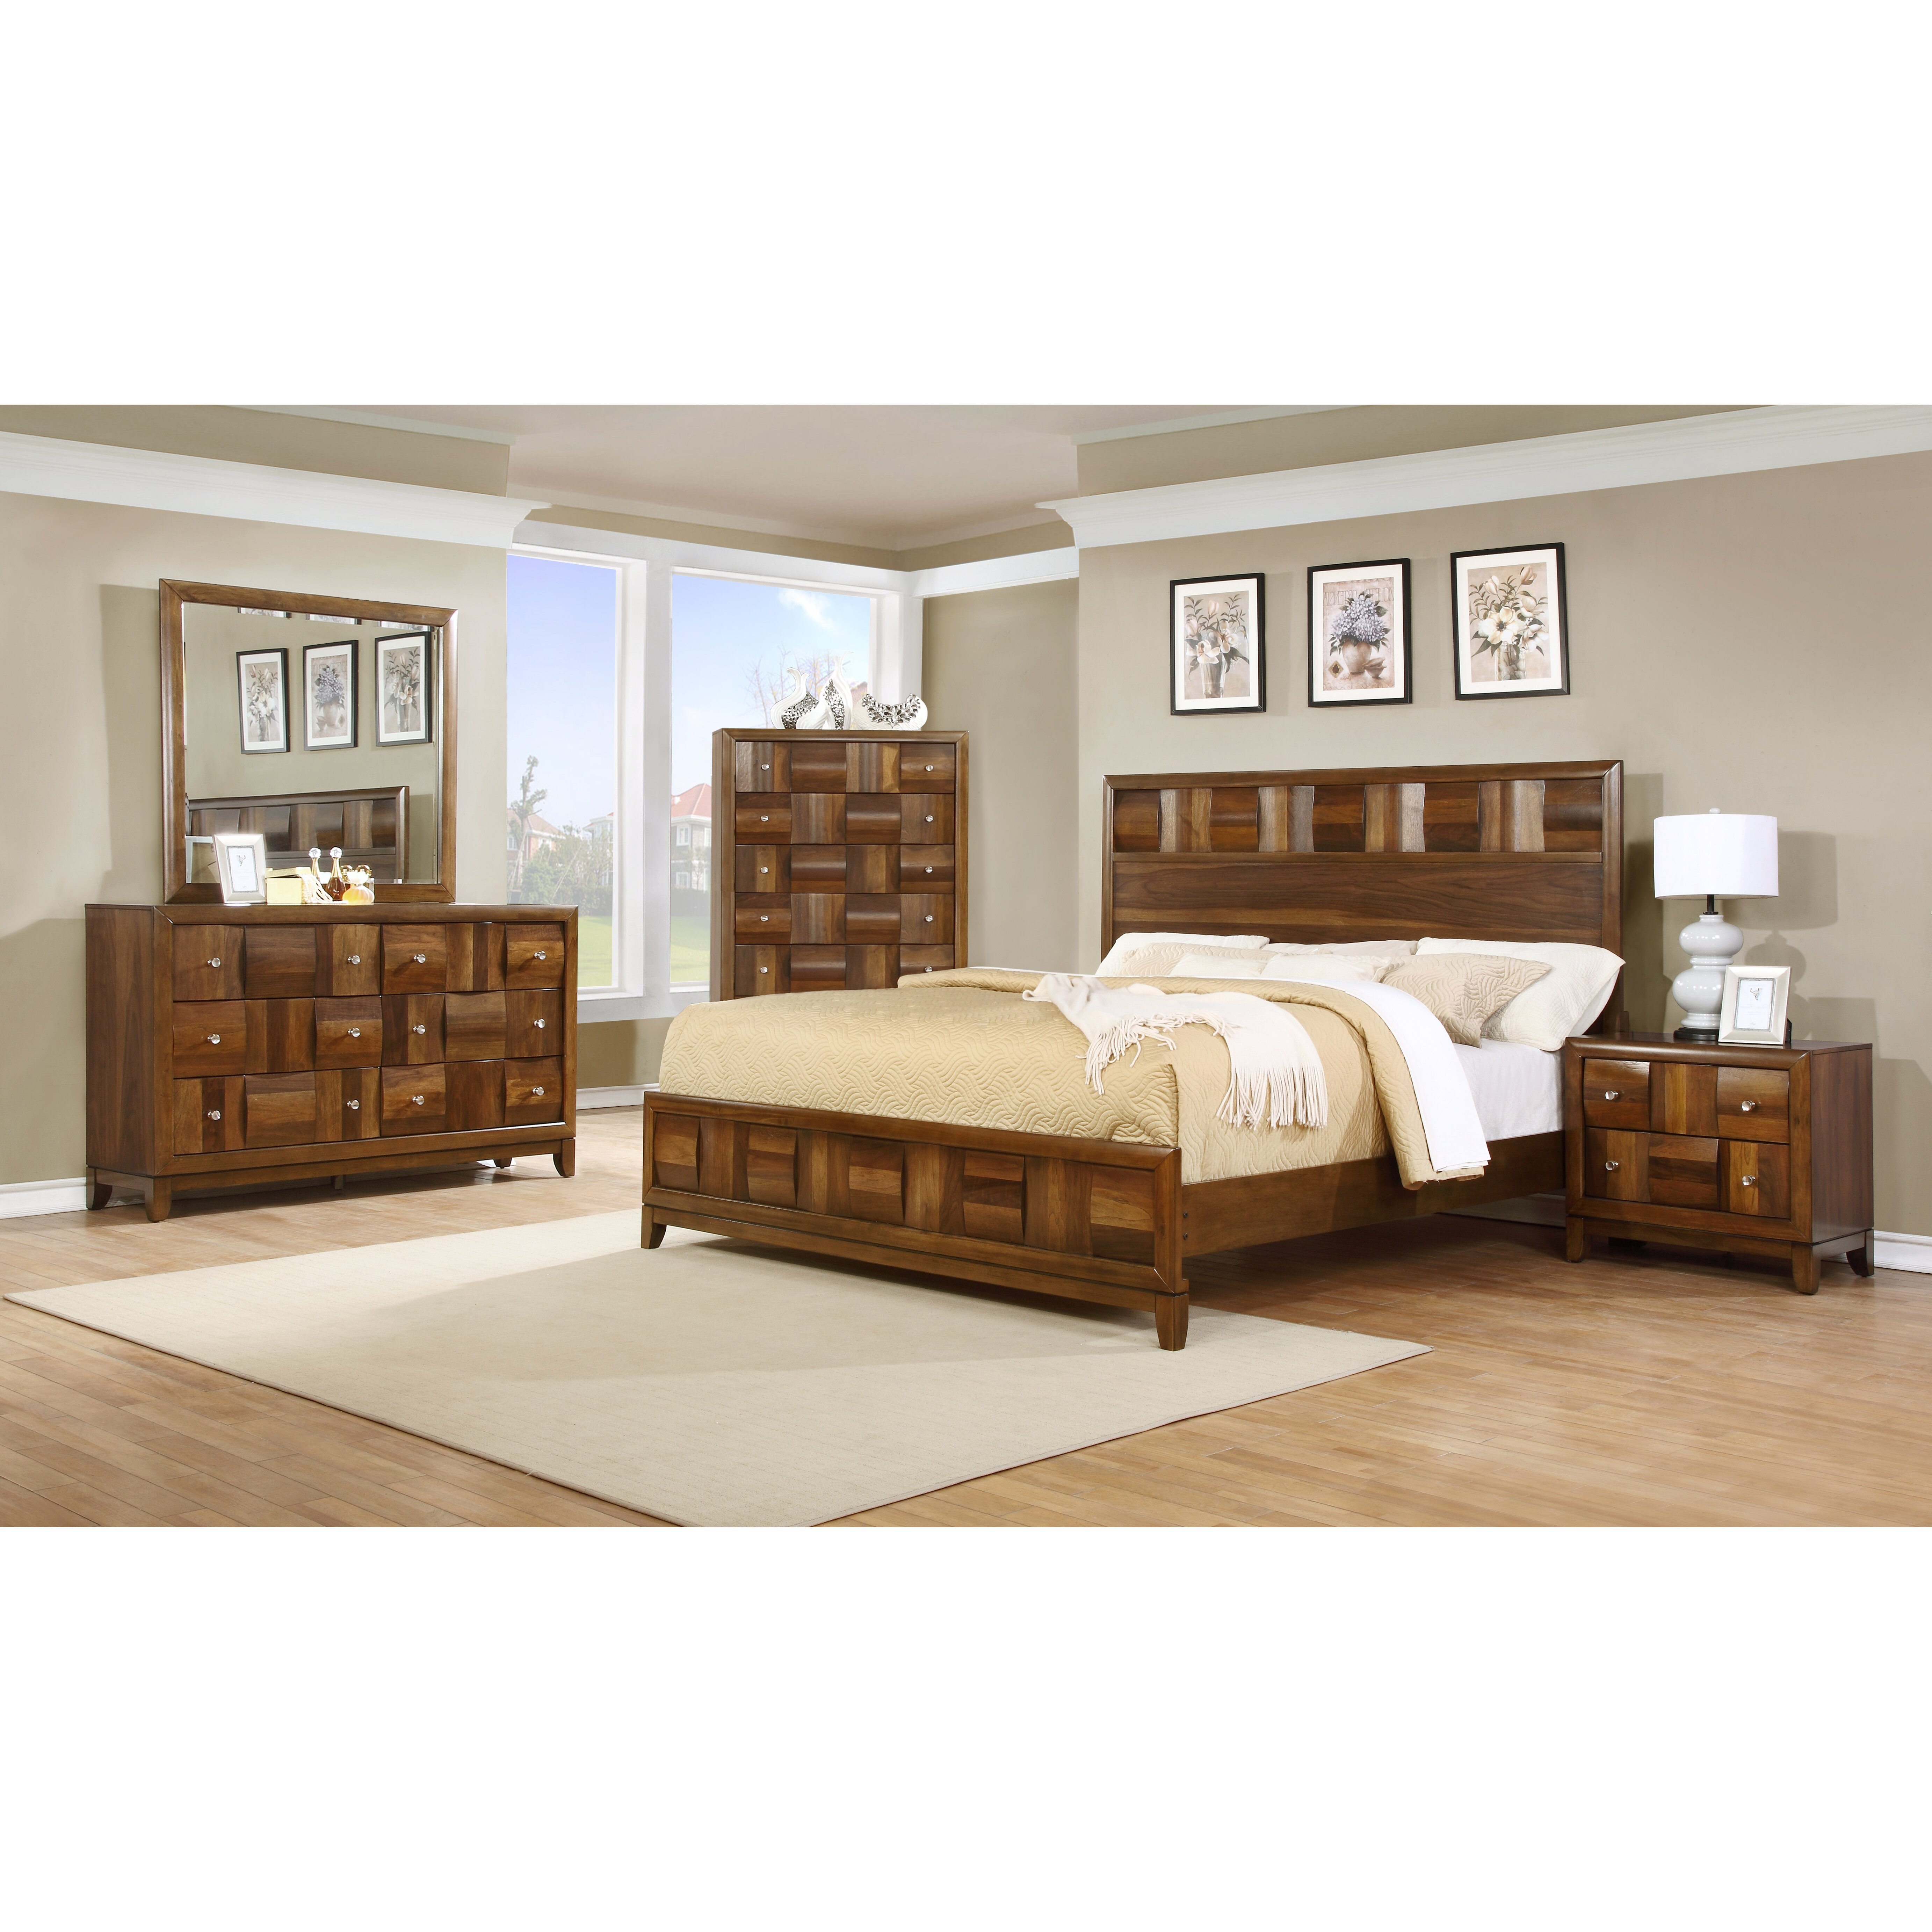 Solid Bedroom Furniture Solid Wood Bedroom Furniture South Africa Best Bedroom Ideas 2017